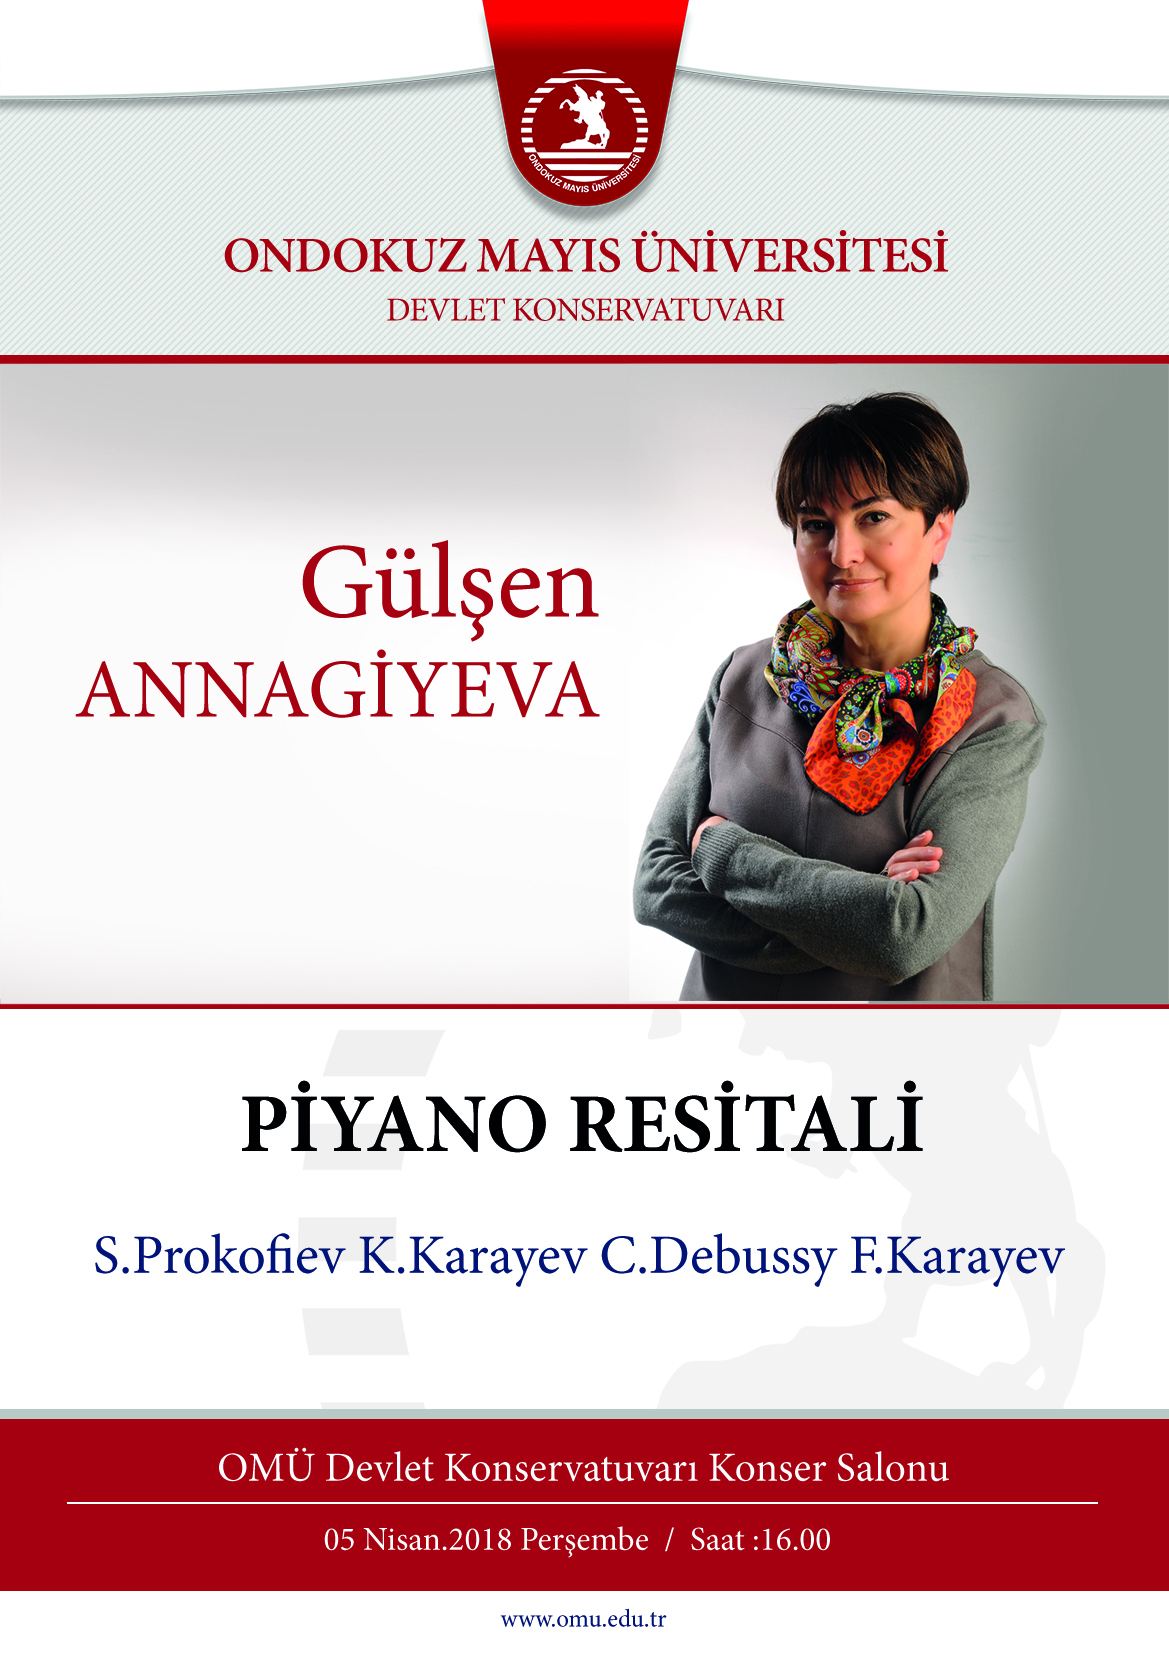 https://www.omu.edu.tr/sites/default/files/piyano-resitali-05-18.jpg